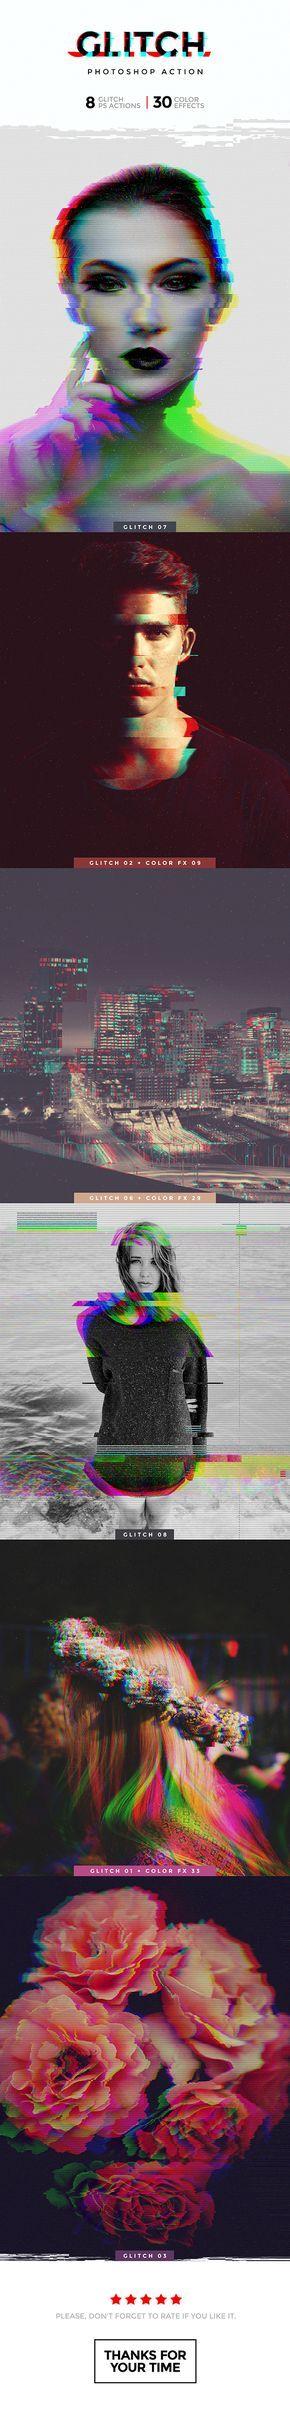 Glitch Photoshop Action — Photoshop ATN #music #pixels • Download ➝ https://graphicriver.net/item/glitch-photoshop-action/19144570?ref=pxcr